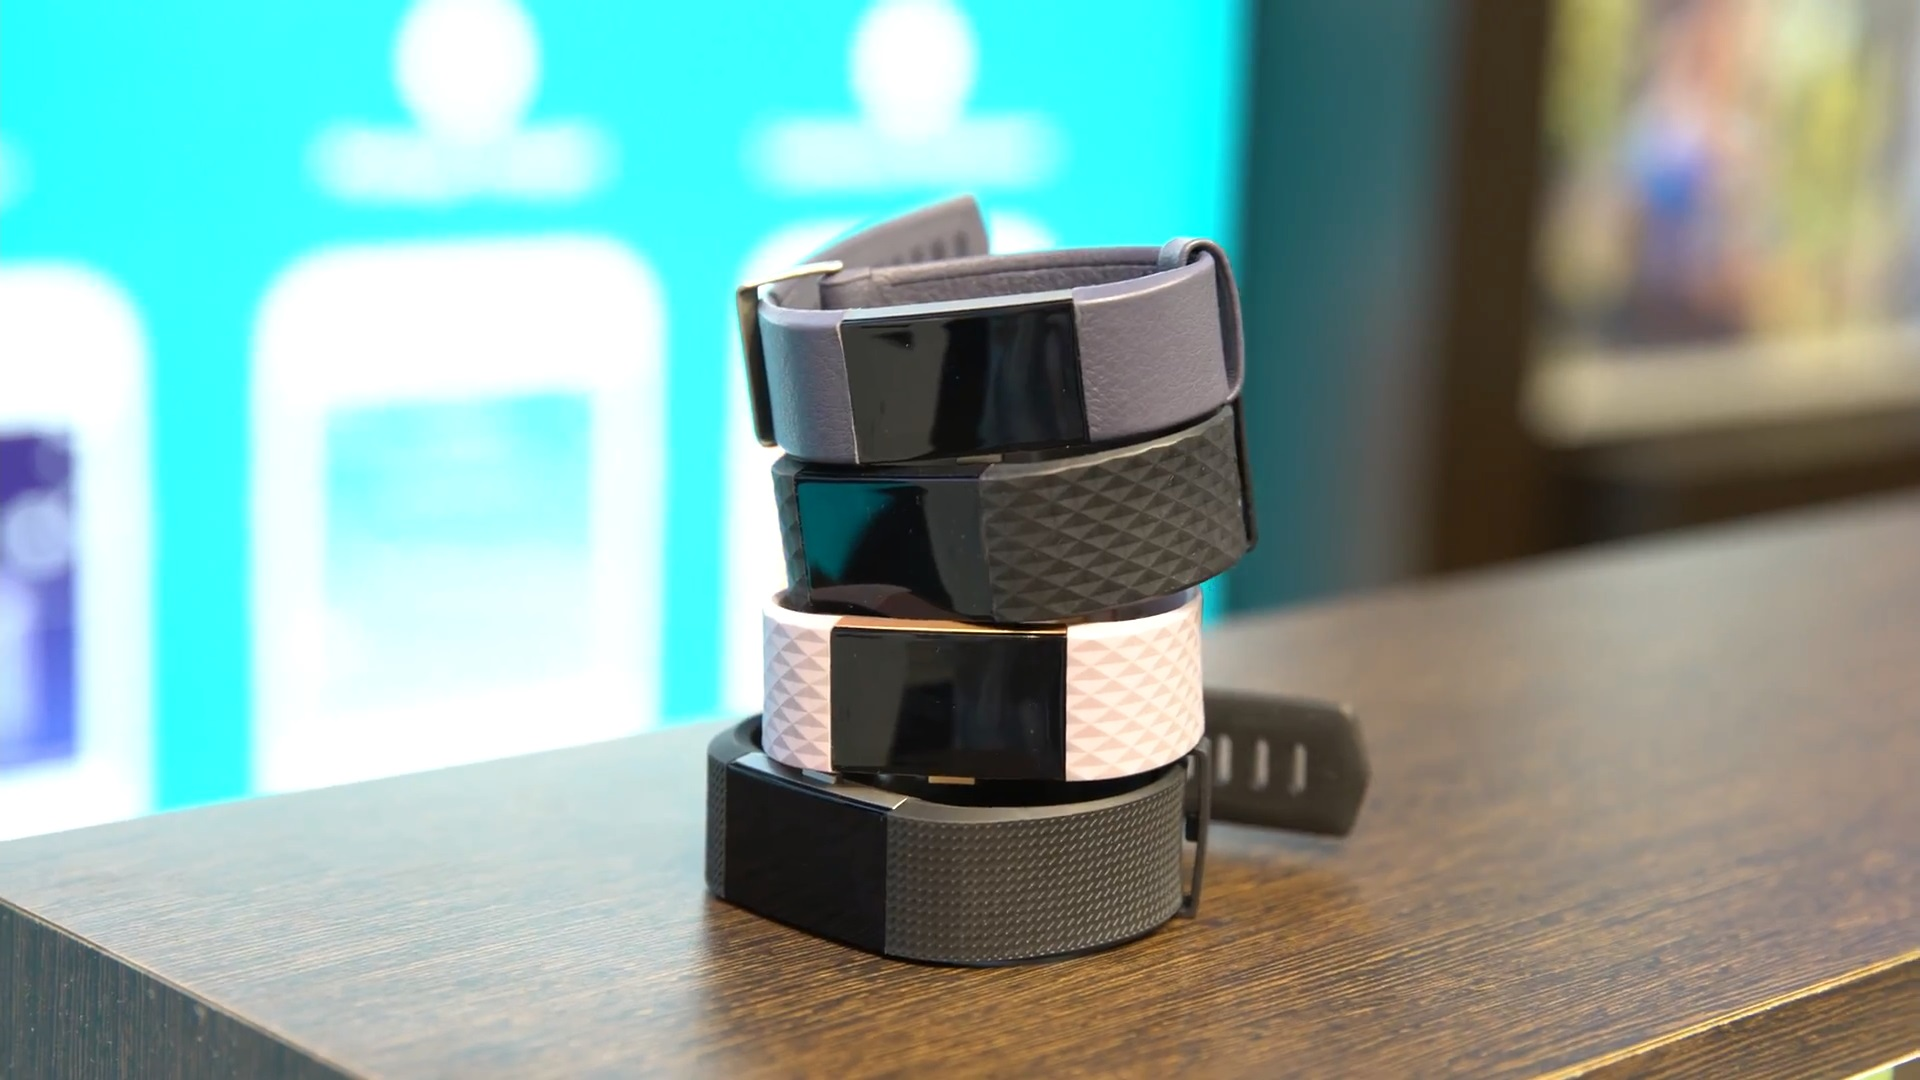 Fitbit Charge 20 neustarten So klappt der Restart des Fitnesstrackers